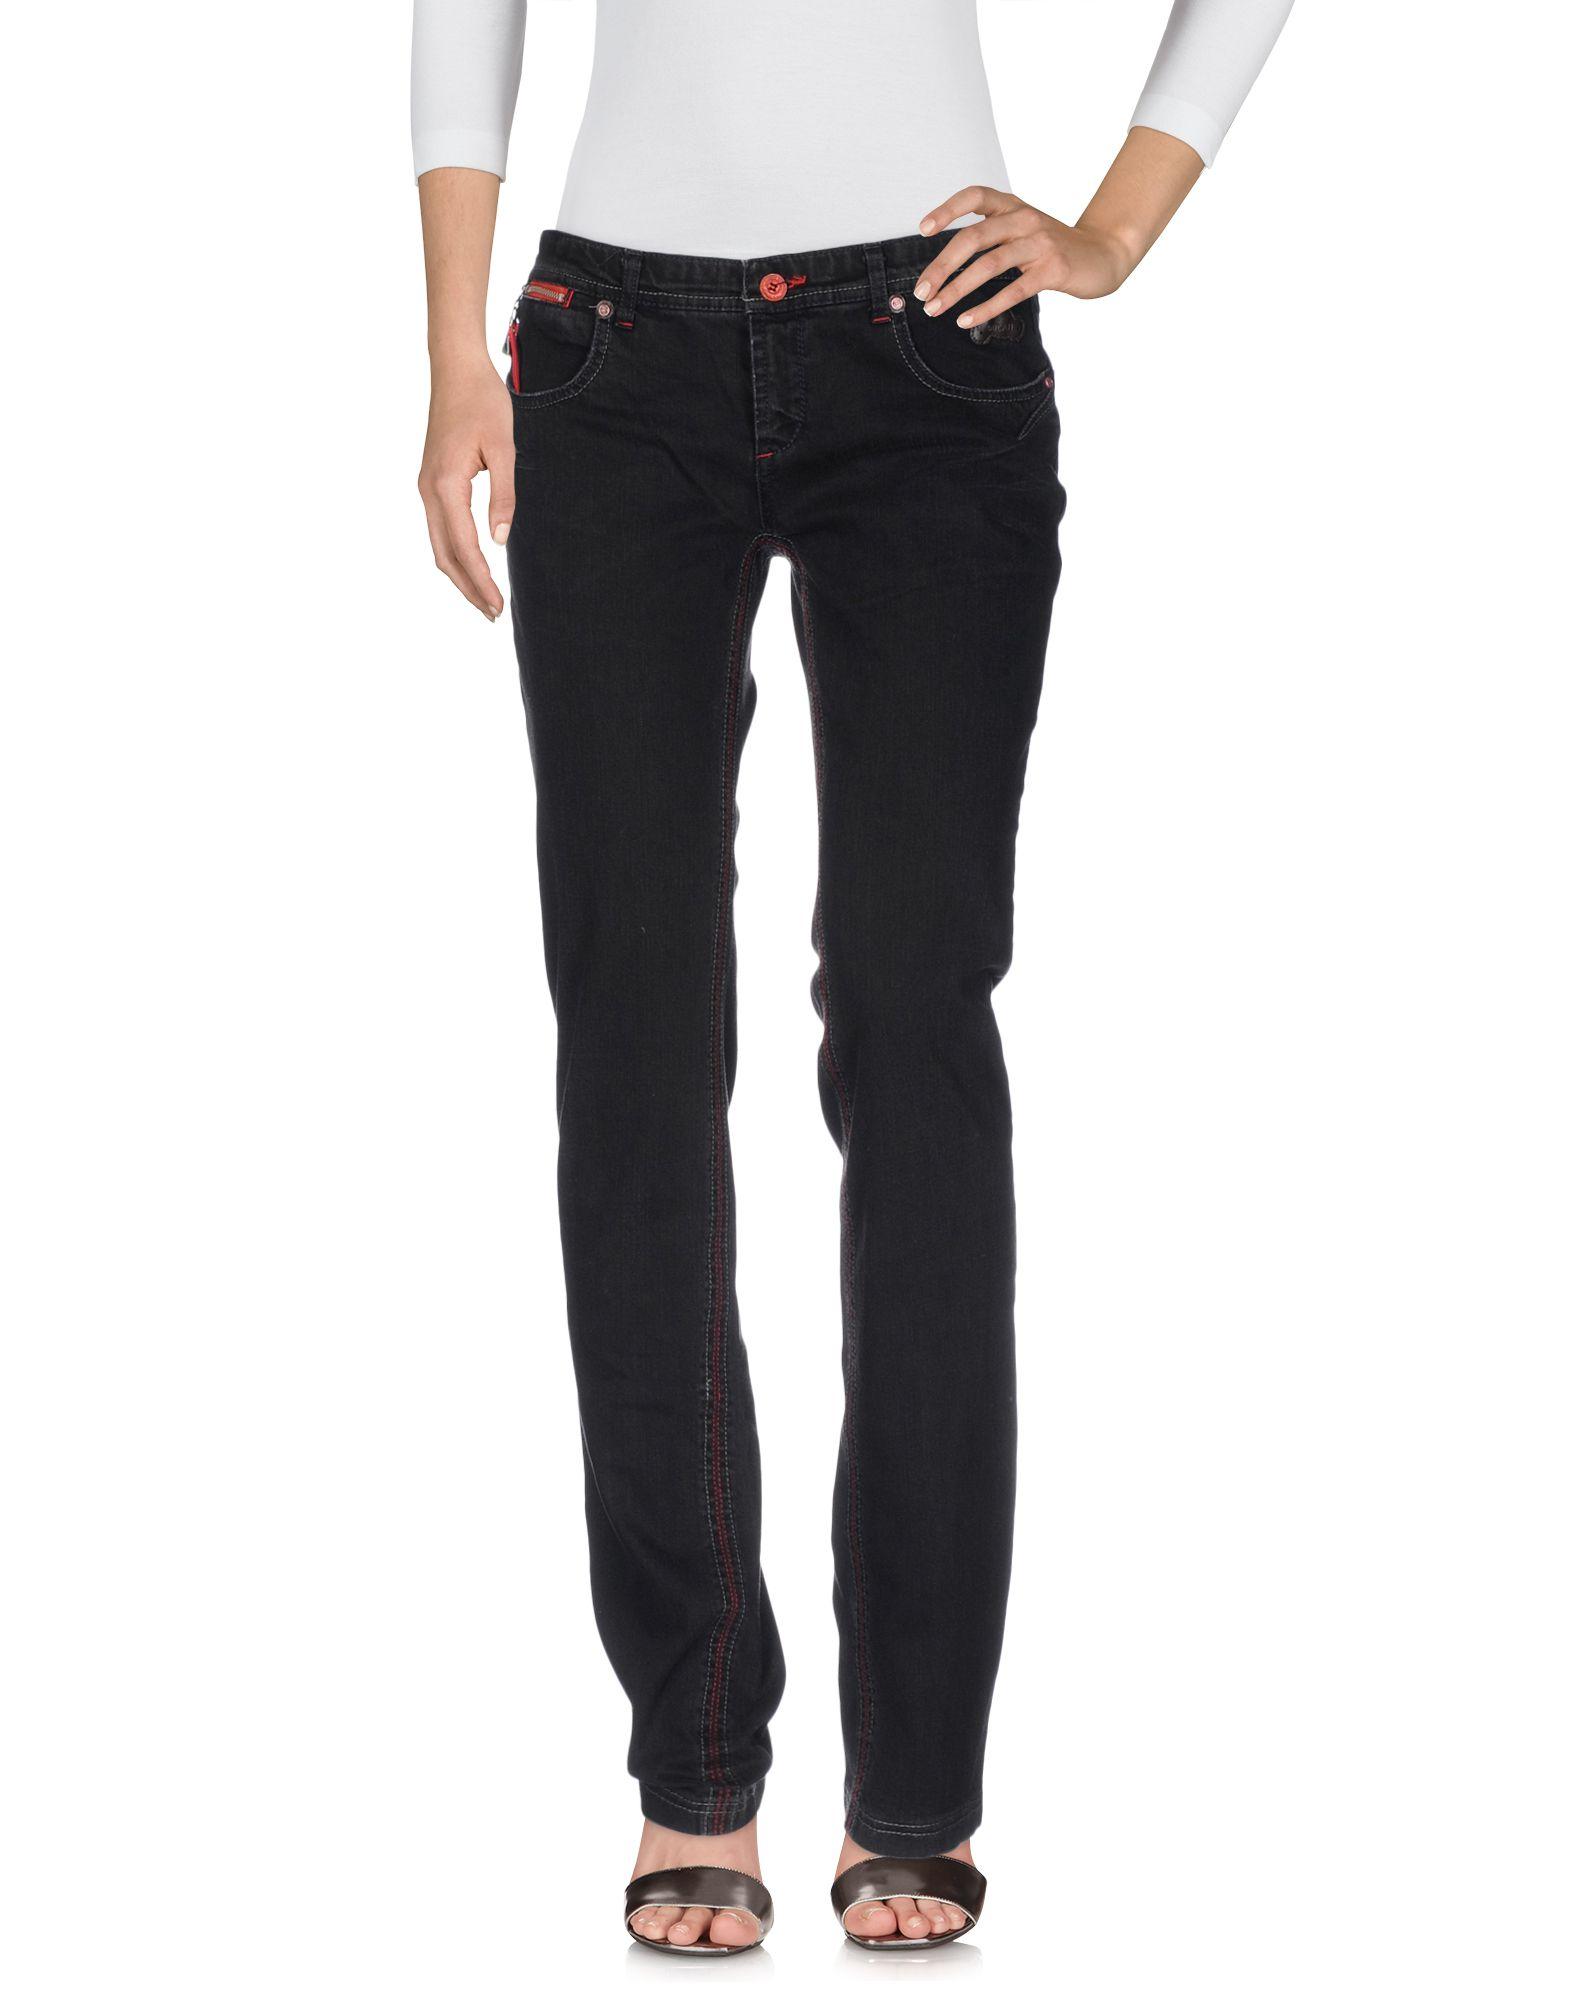 C'N'C COSTUME NATIONAL FOR DUCATI Джинсовые брюки